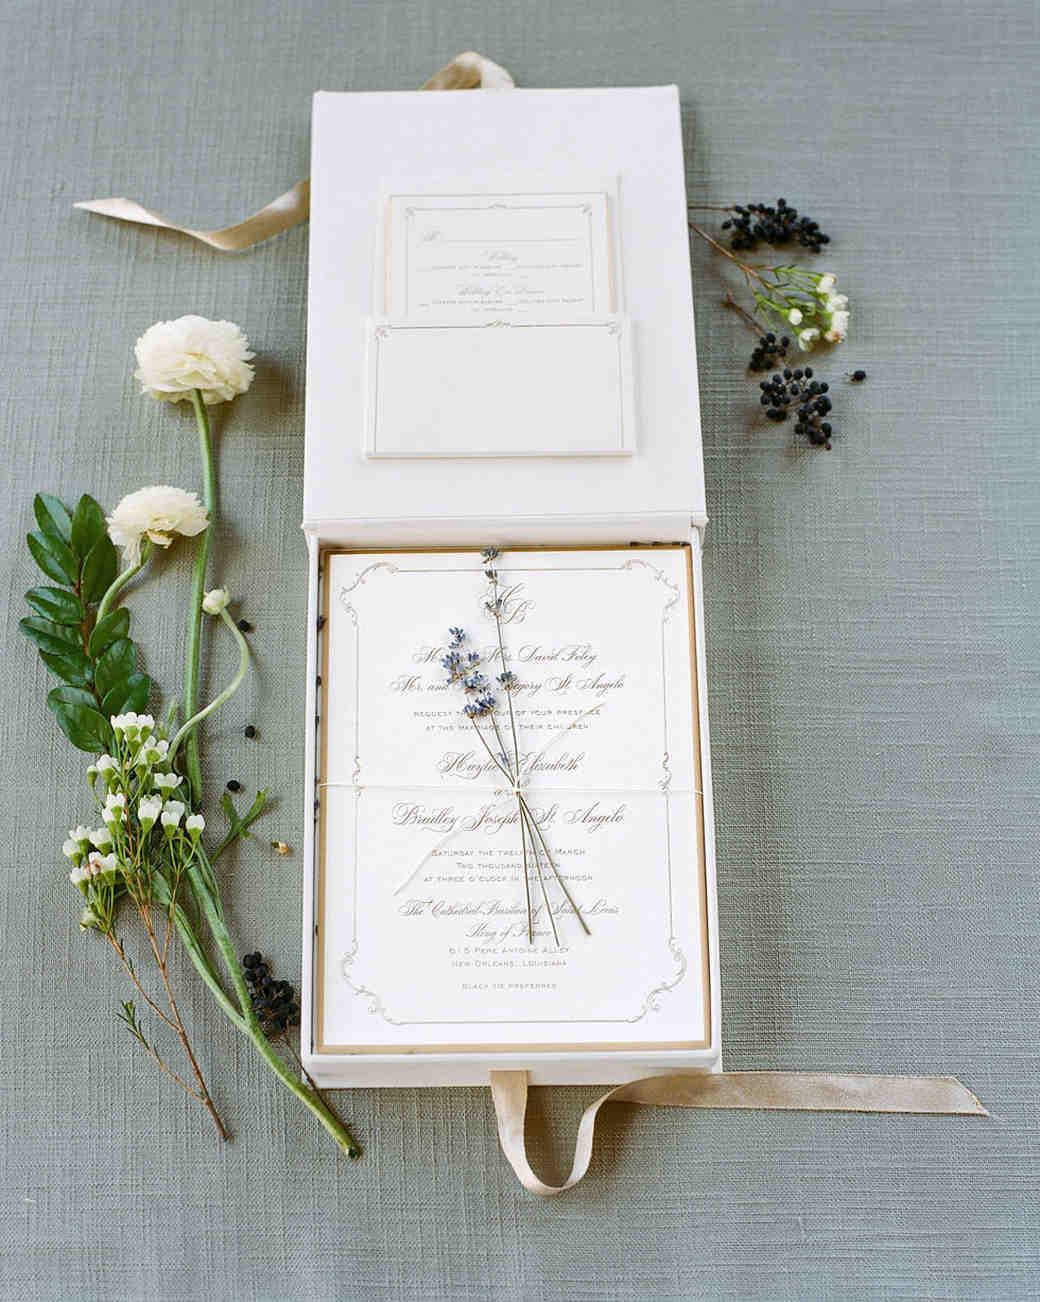 Elegant White Spring Wedding Invitation with Lavender Sprig